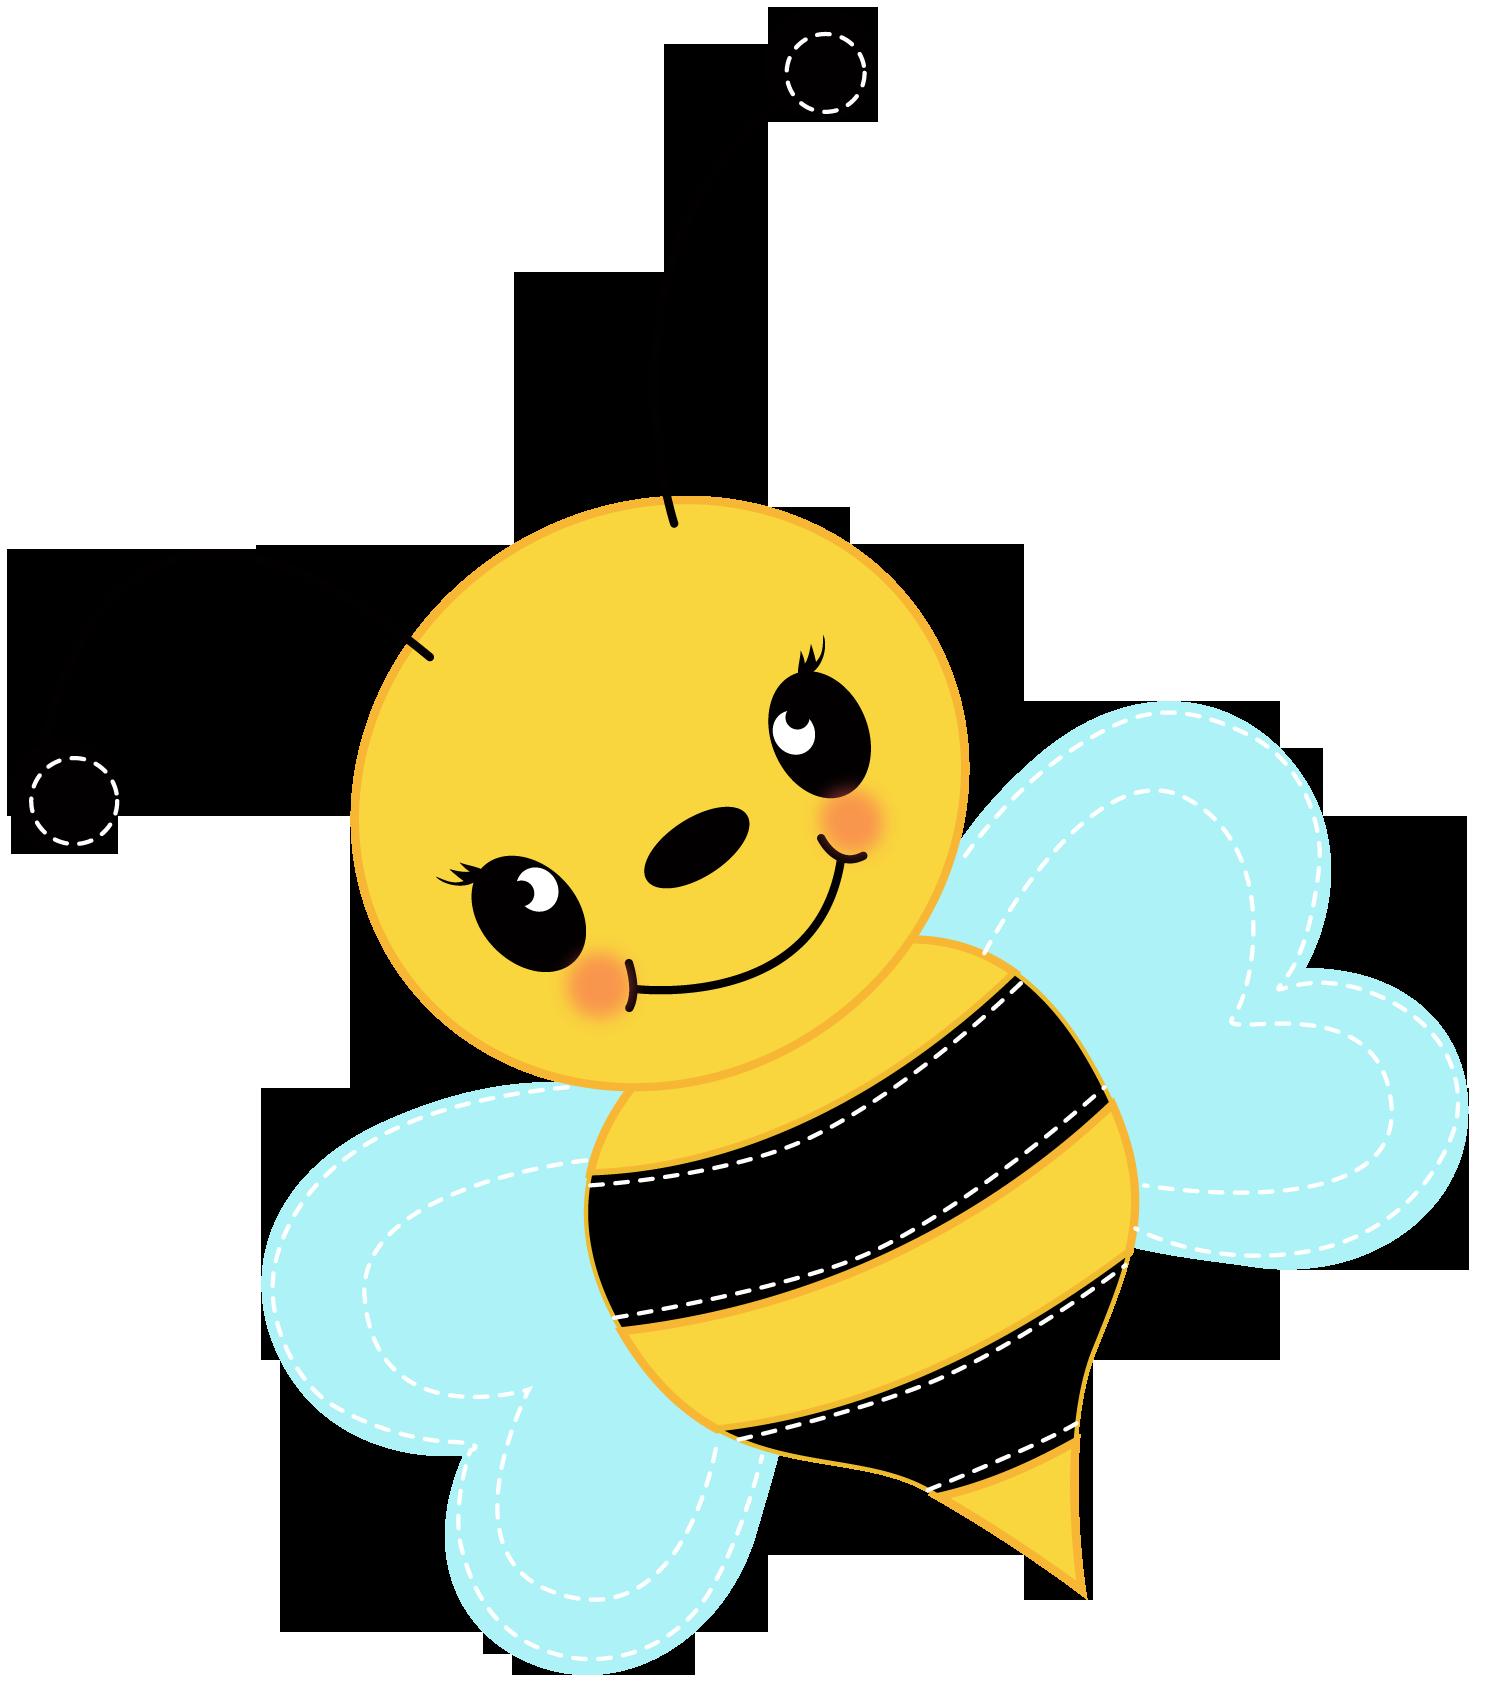 1490x1702 Cute Bumble Bee Clip Art On Dayasrionb Bid